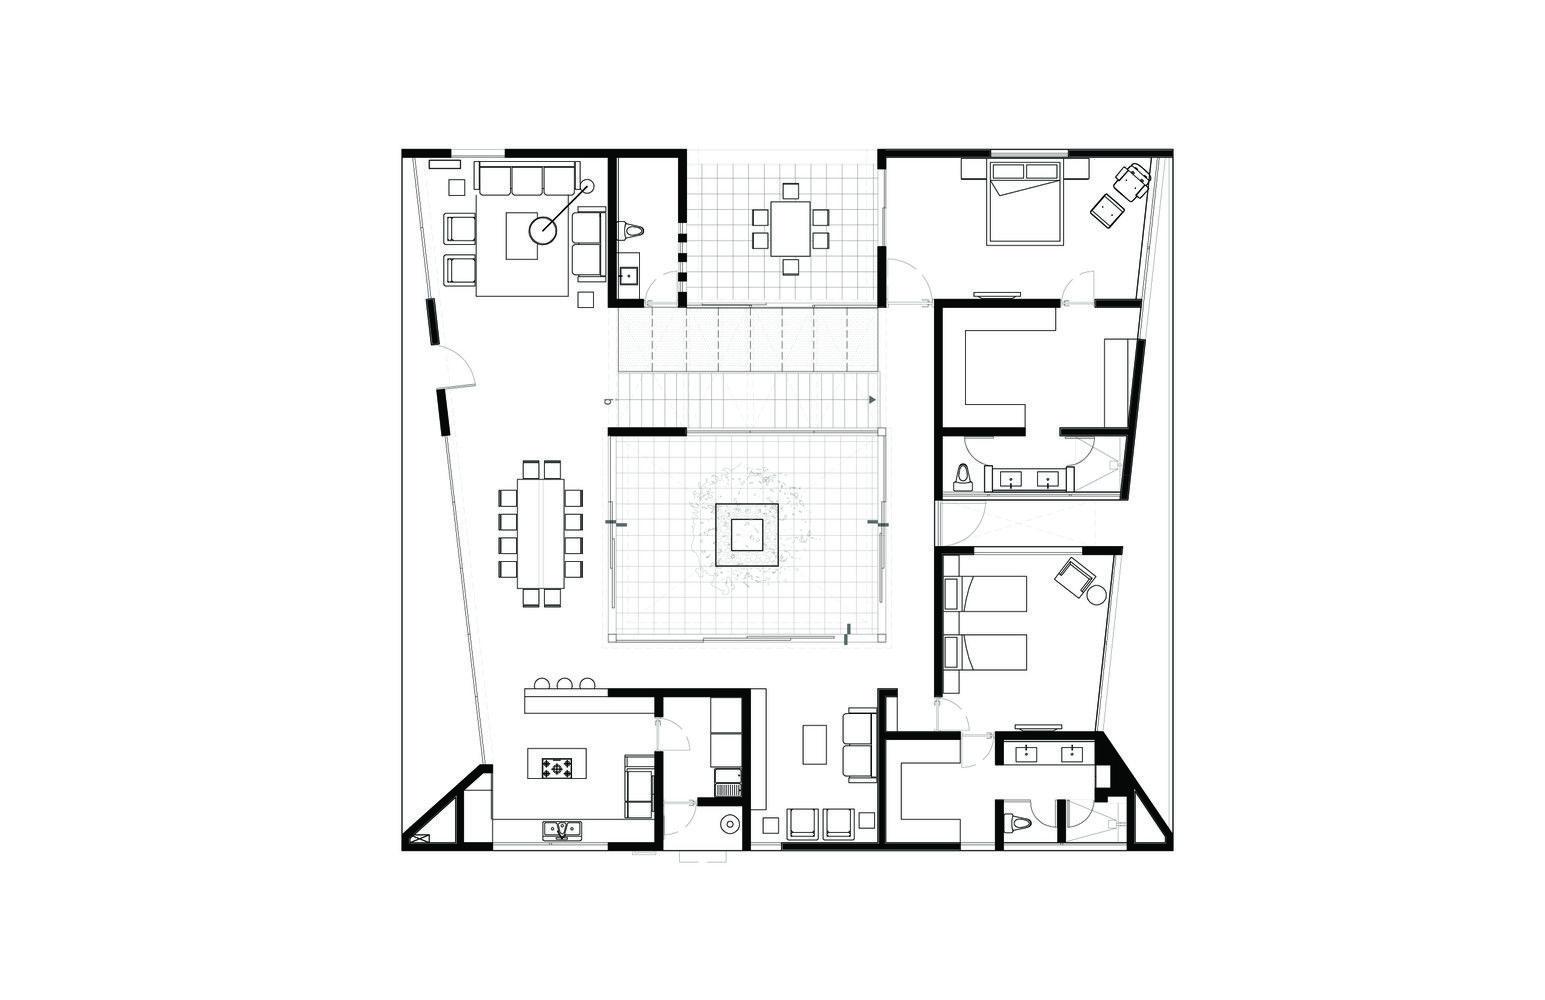 Dibujo t cnico conceptos generales sobre dibujo for Normas para planos arquitectonicos